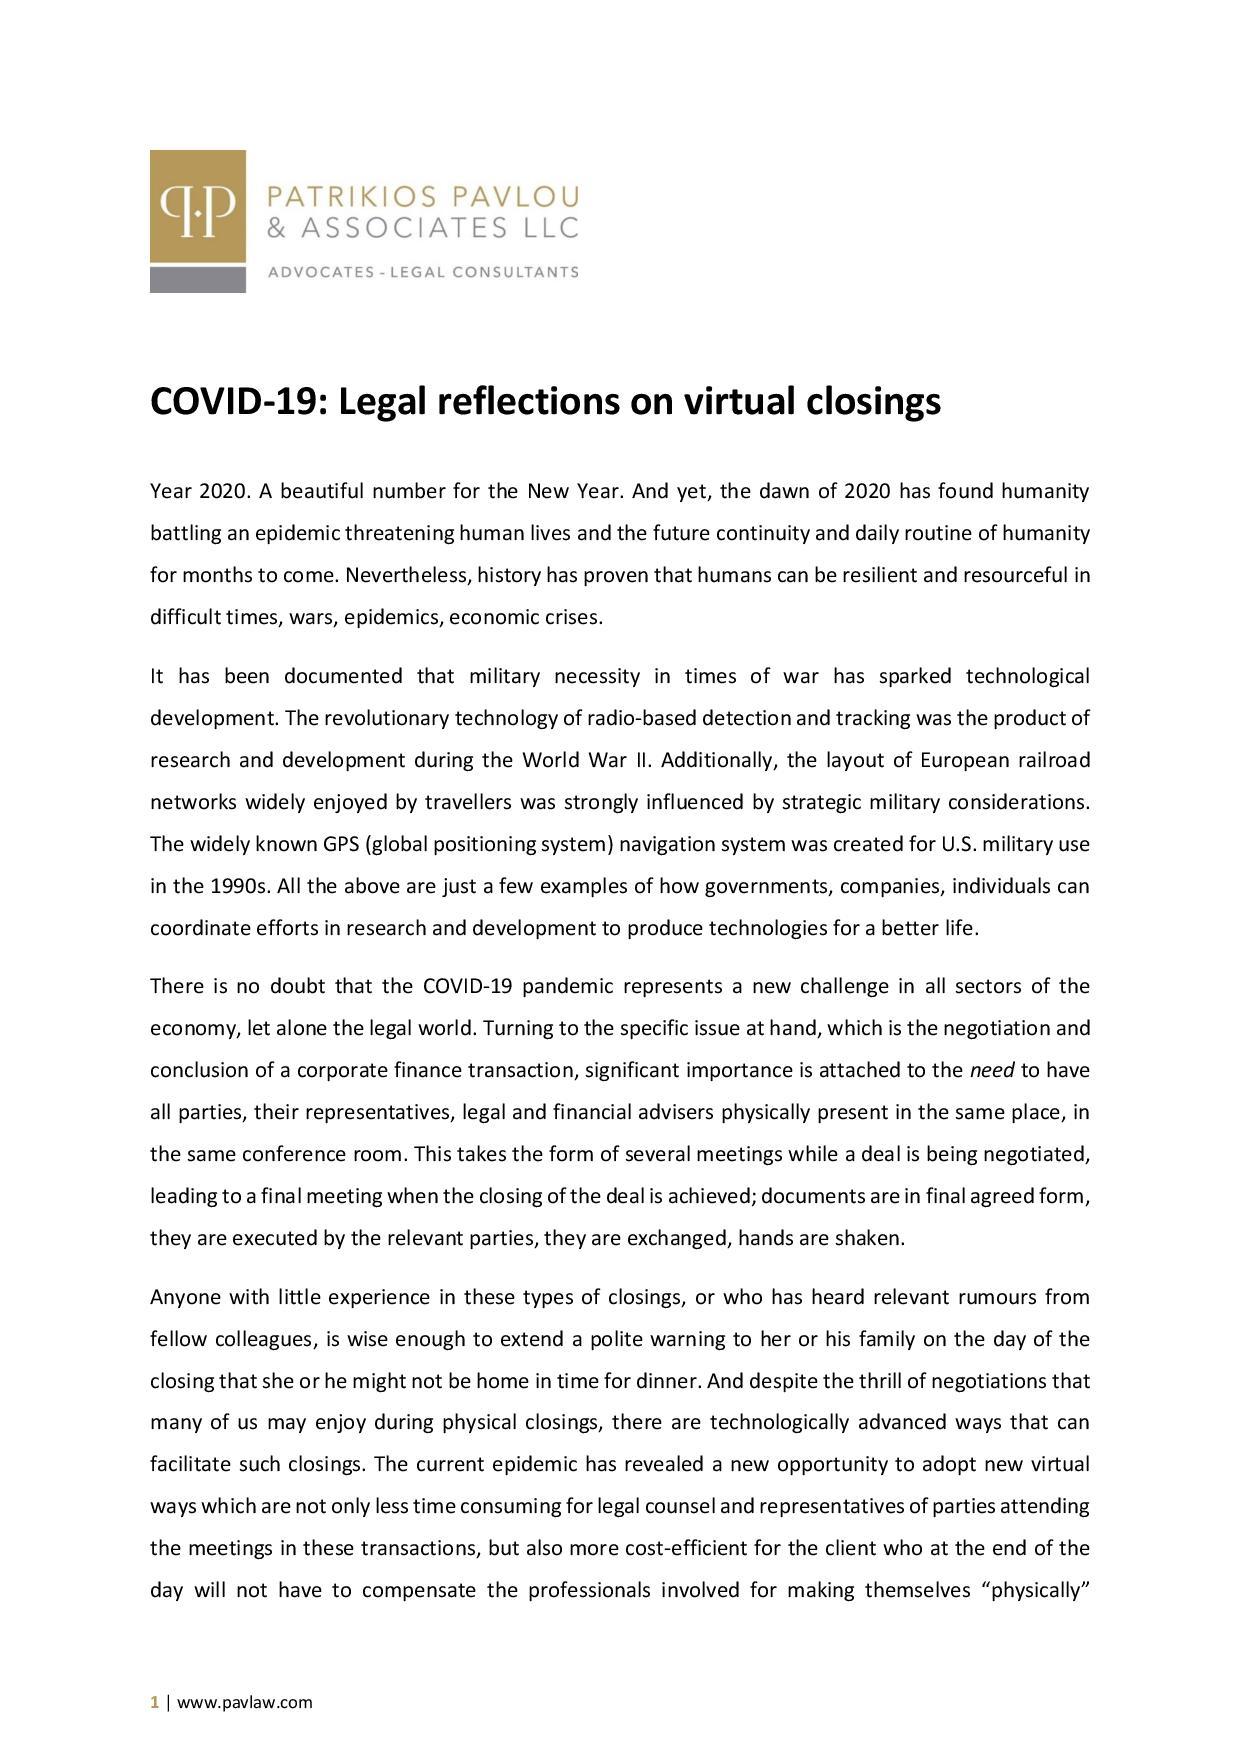 Patrikios Pavlou & Associates LLC: COVID-19: Legal reflections on virtual closings